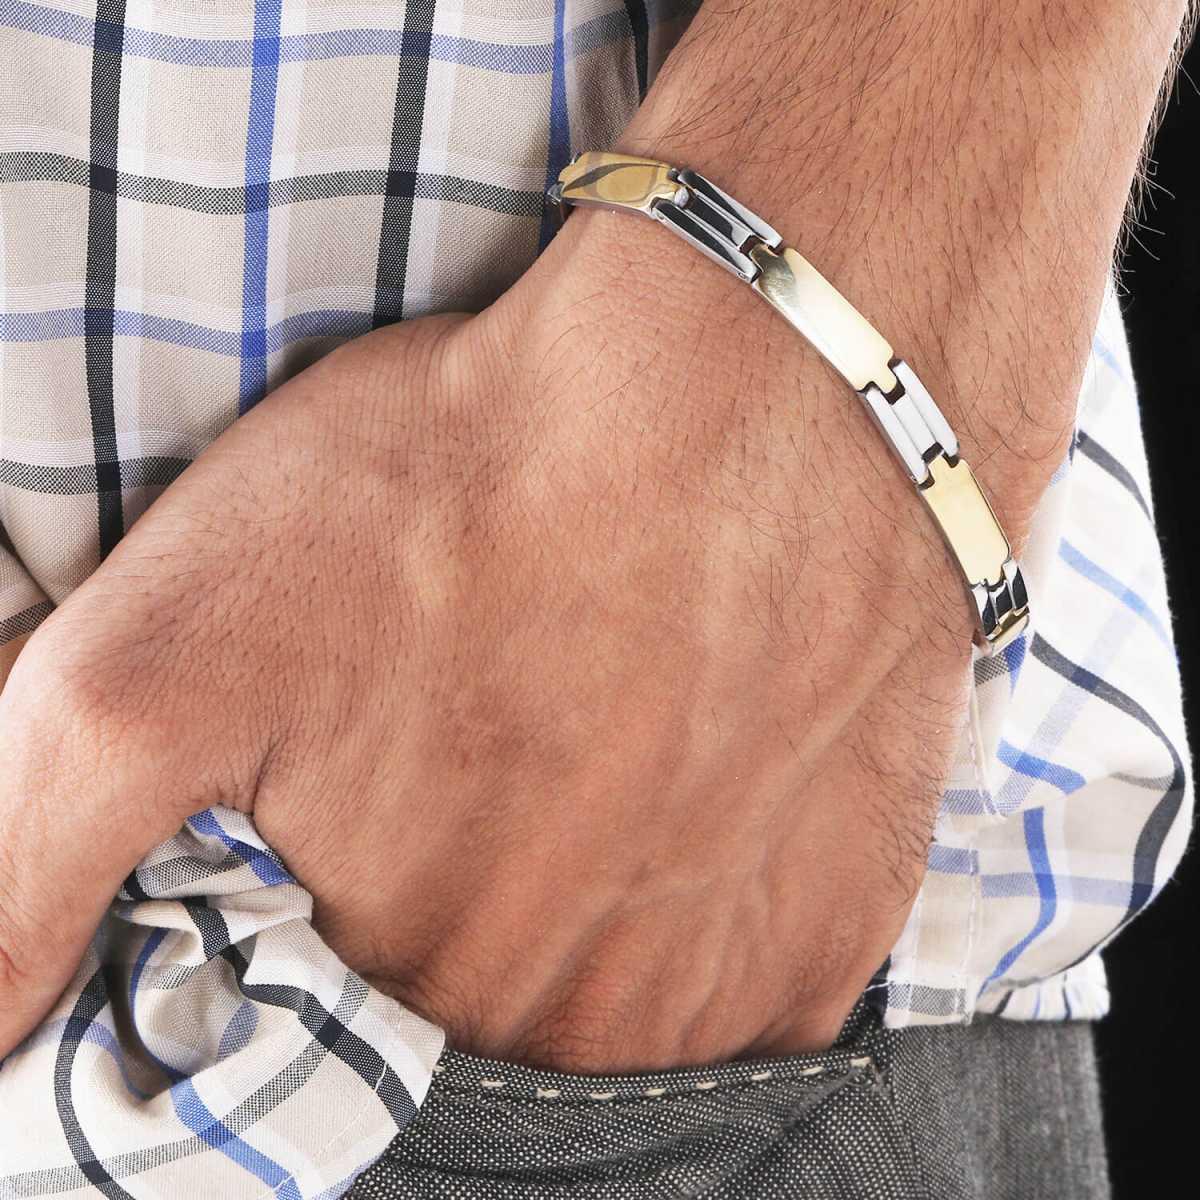 Awesome Slim Designer Bracelet for men Jewellery